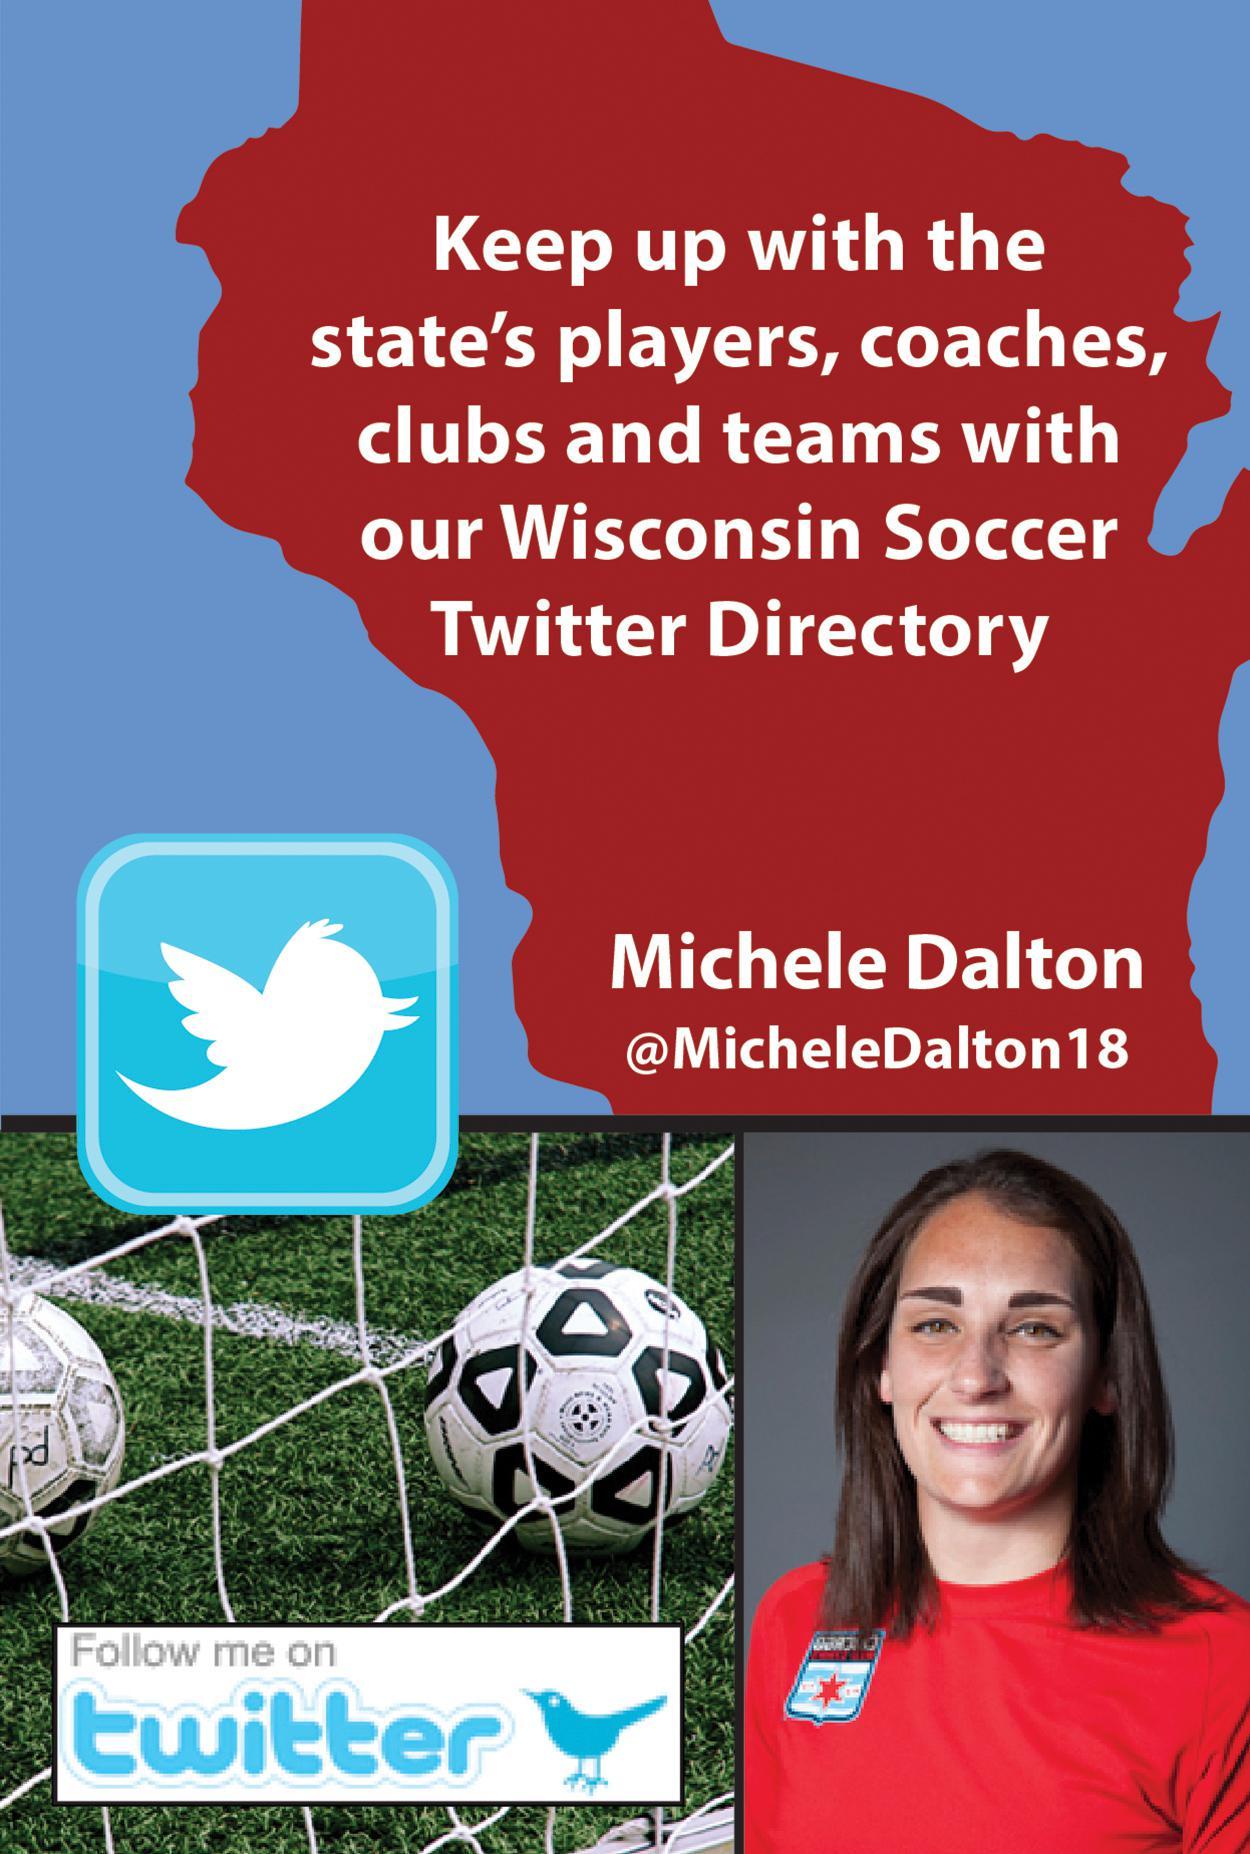 Wisconsin Twitter Directory promo: Michele Dalton